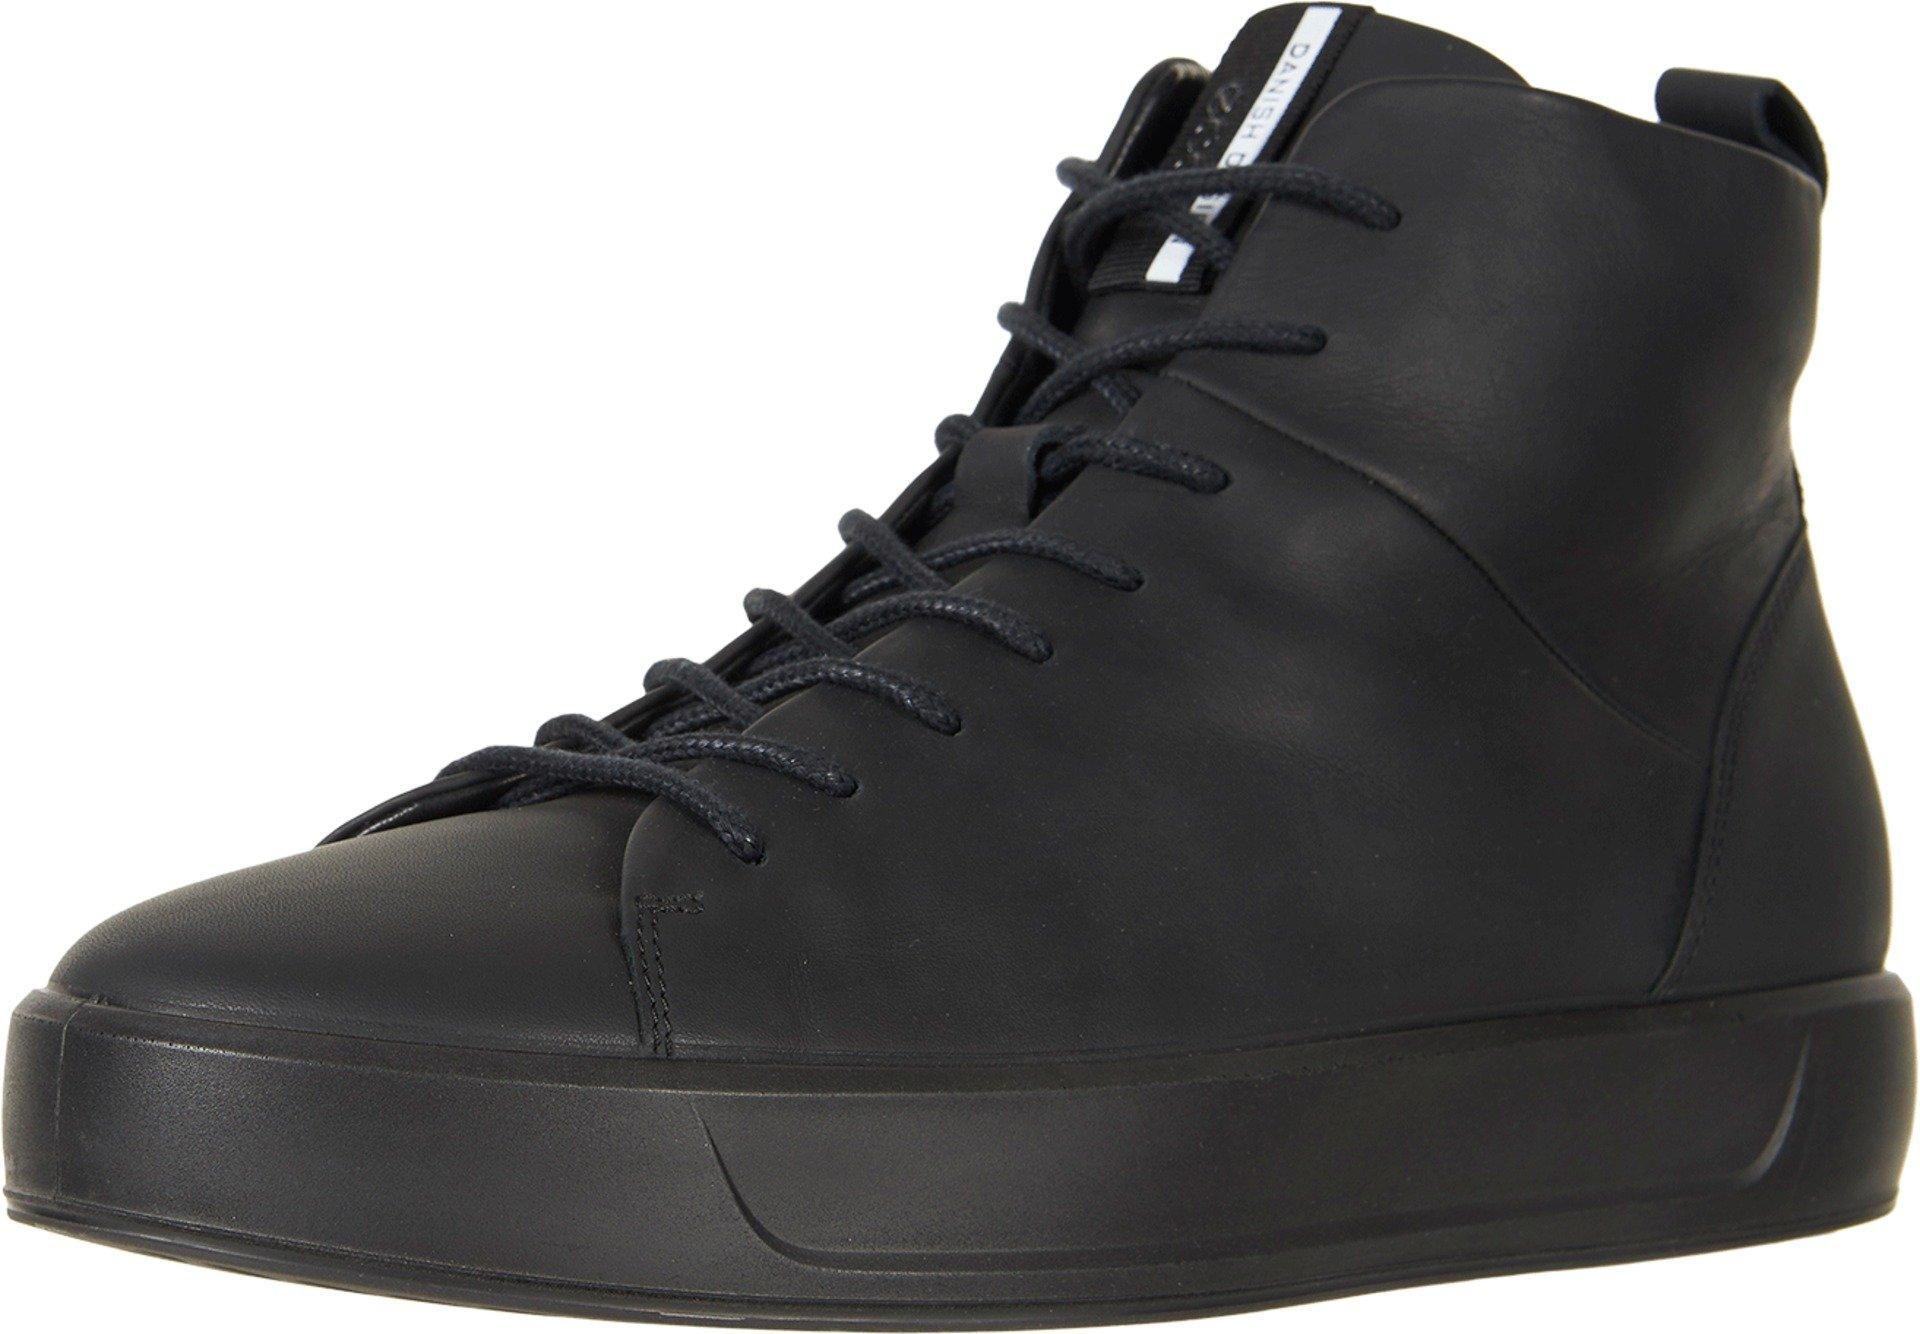 ECCO Men's Soft 8 High Top Fashion Sneaker, Black/Black, 44 M EU/10-10.5 D(M) US by ECCO